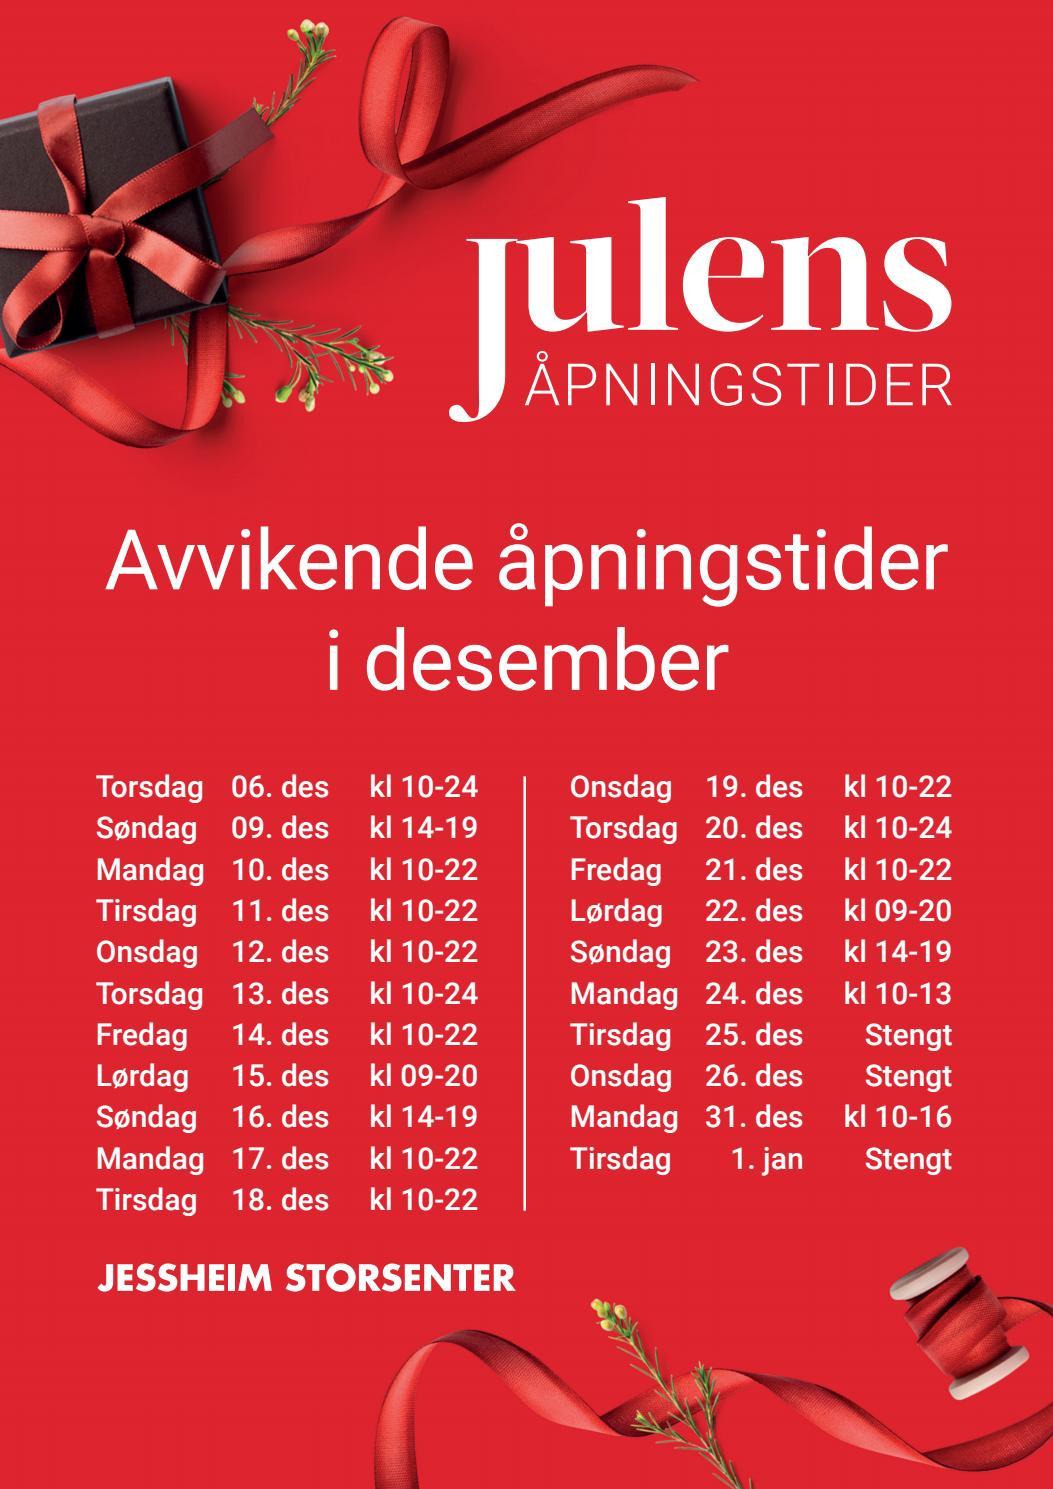 Jessheim Storsenter Juleåpent